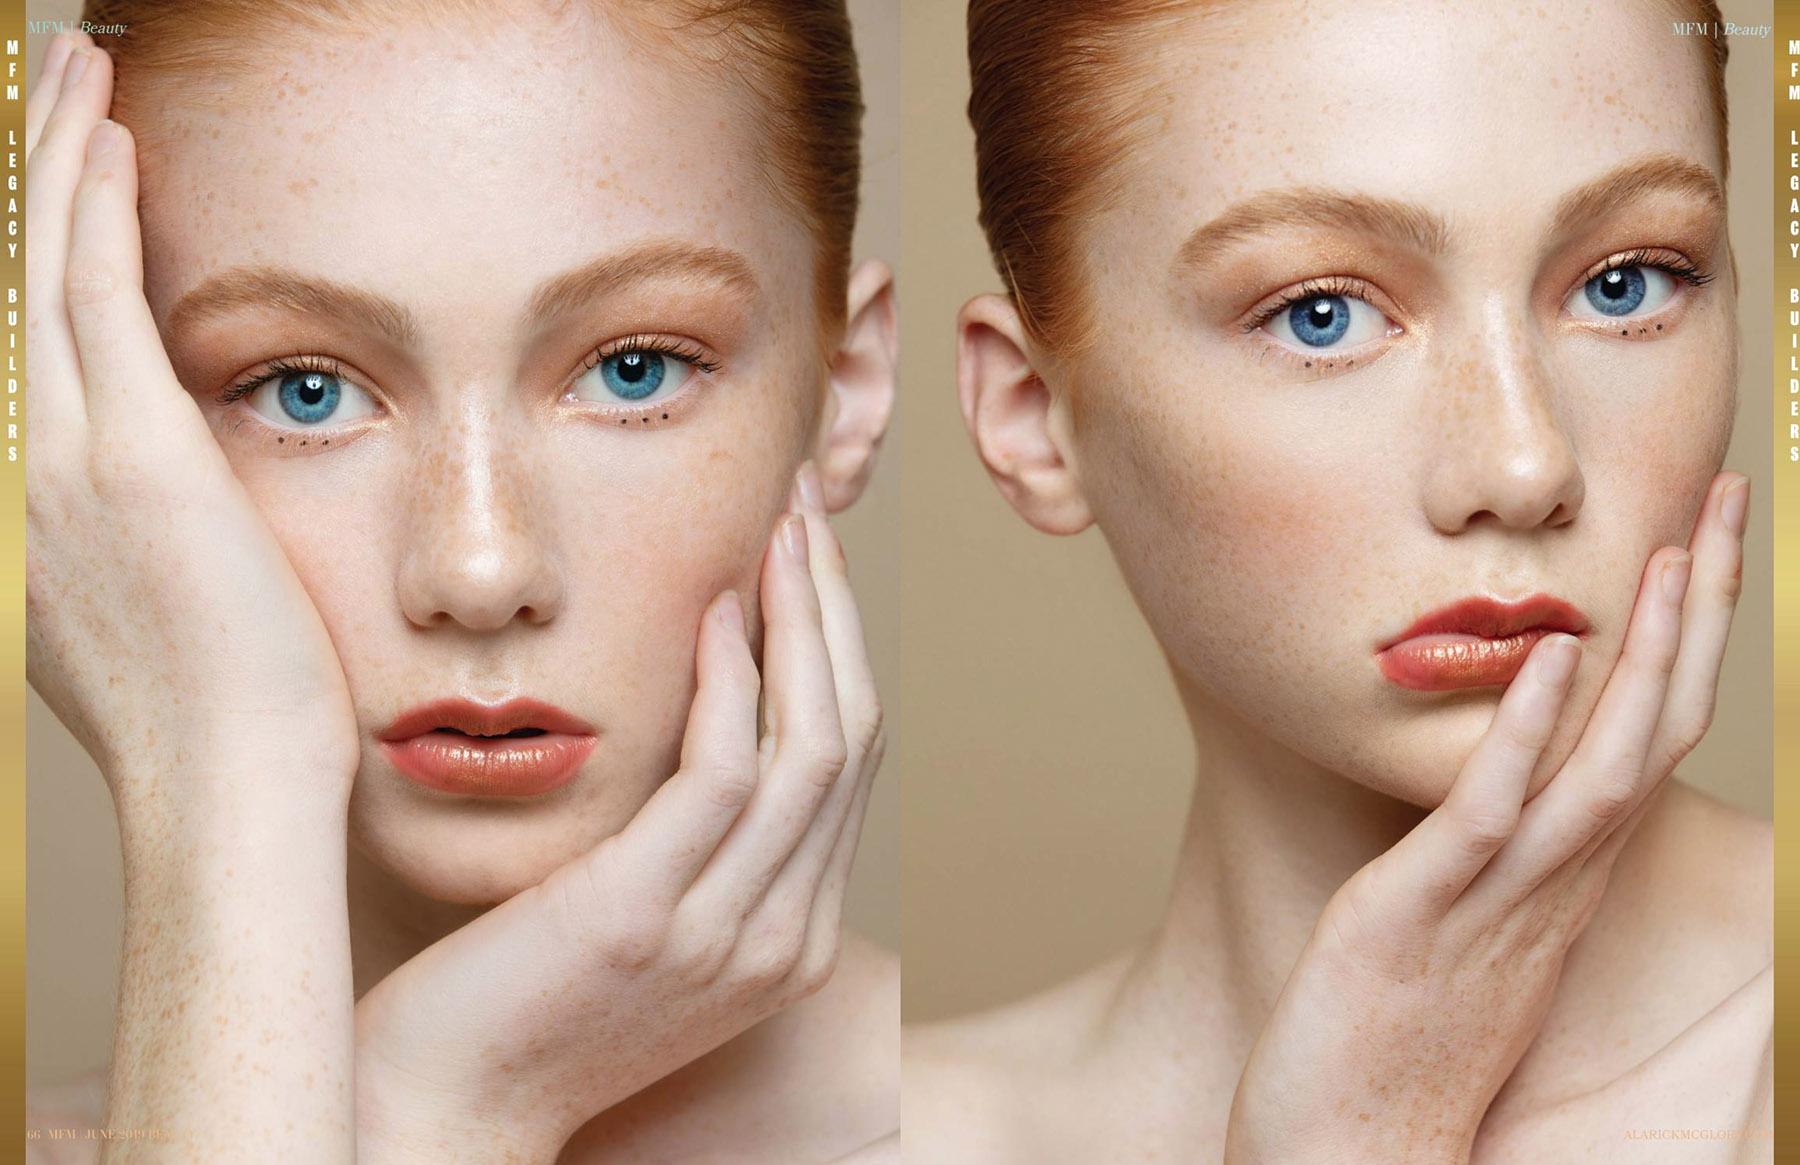 Beauty photoshoot publication with Piper MacKinnon in MFM Magazine by Loesje Kessels Fashion Photographer Dubai